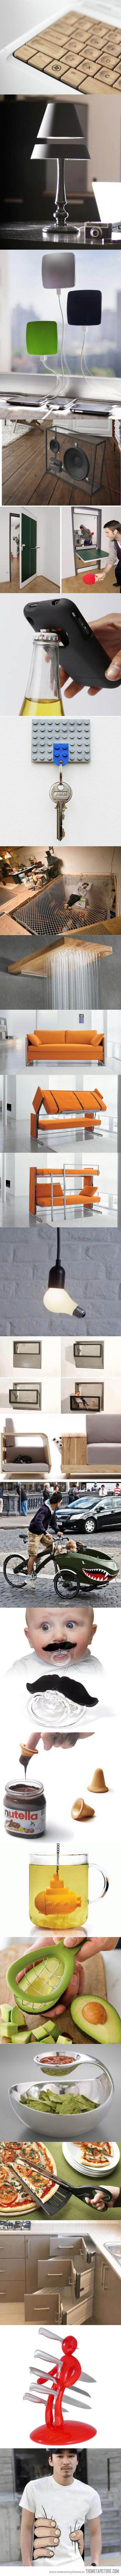 Clever, design